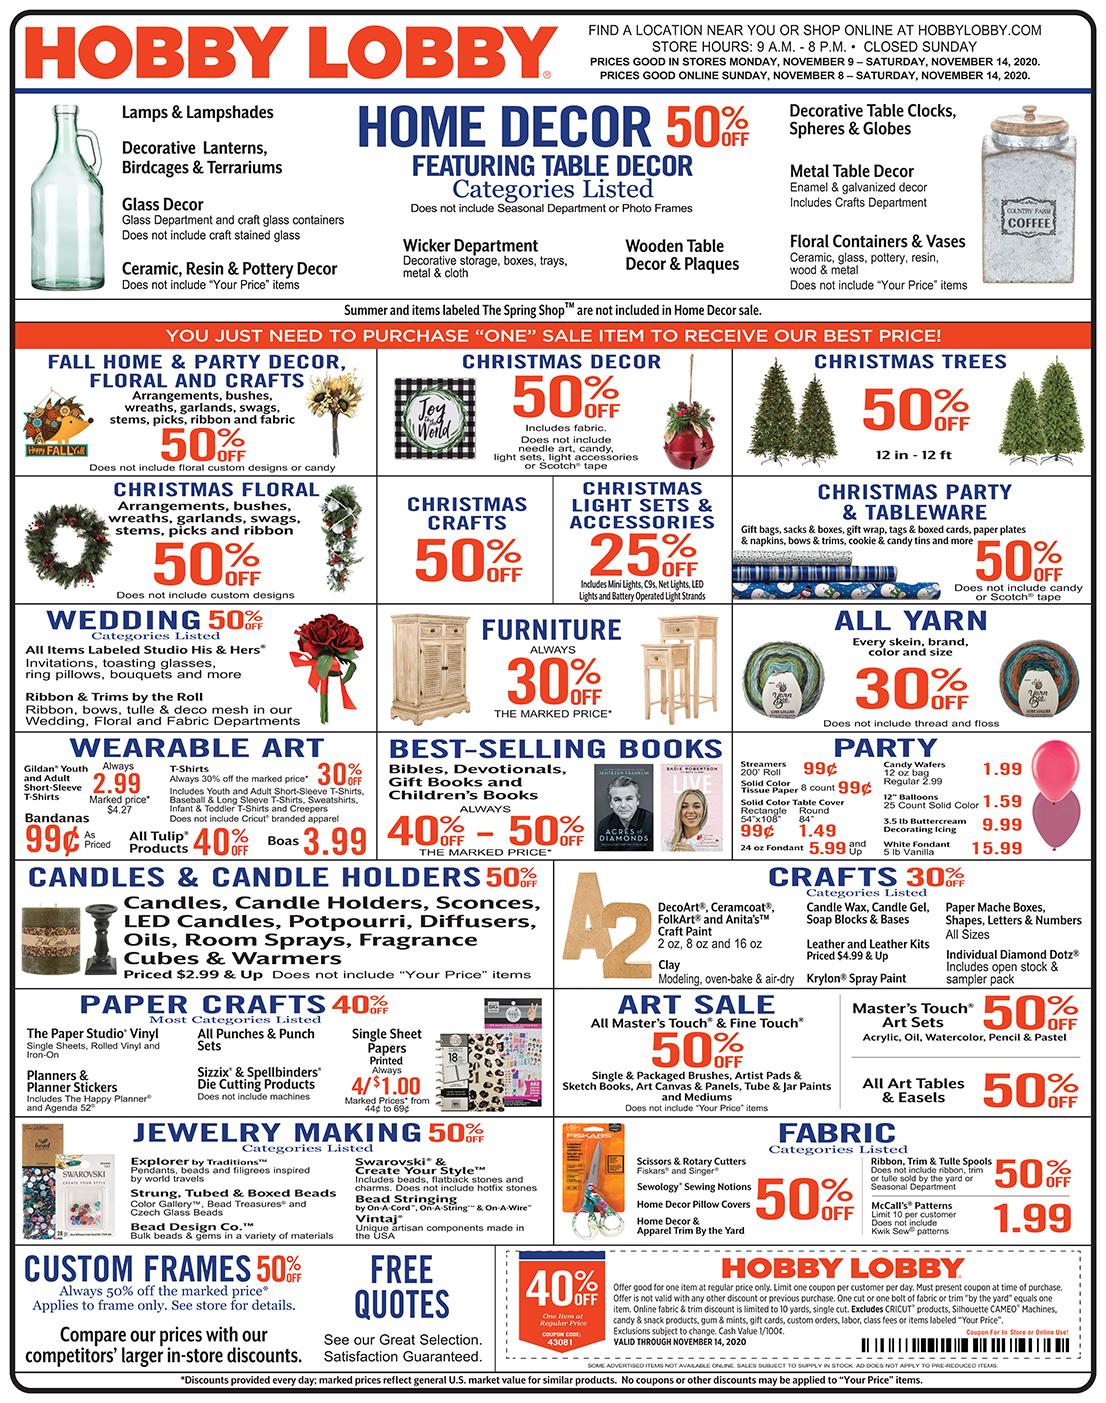 Hobby Lobby Weekly Ad - Prices Good Through November 14th 2020